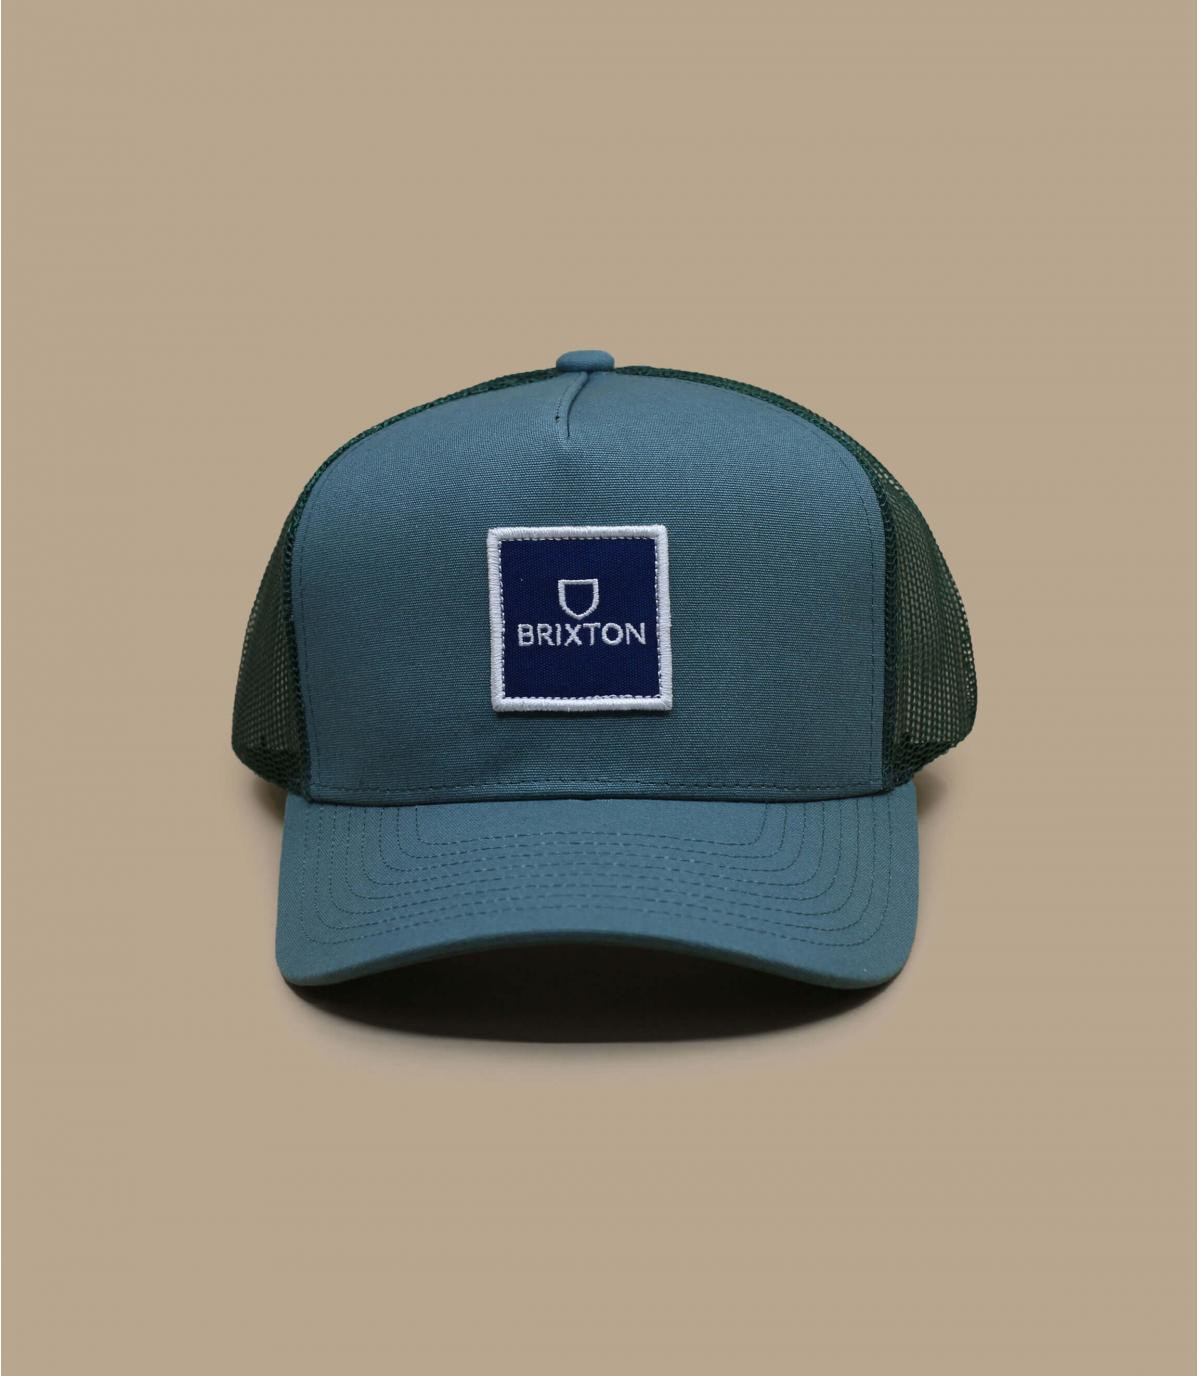 Trucker Cap Brixton blau grau